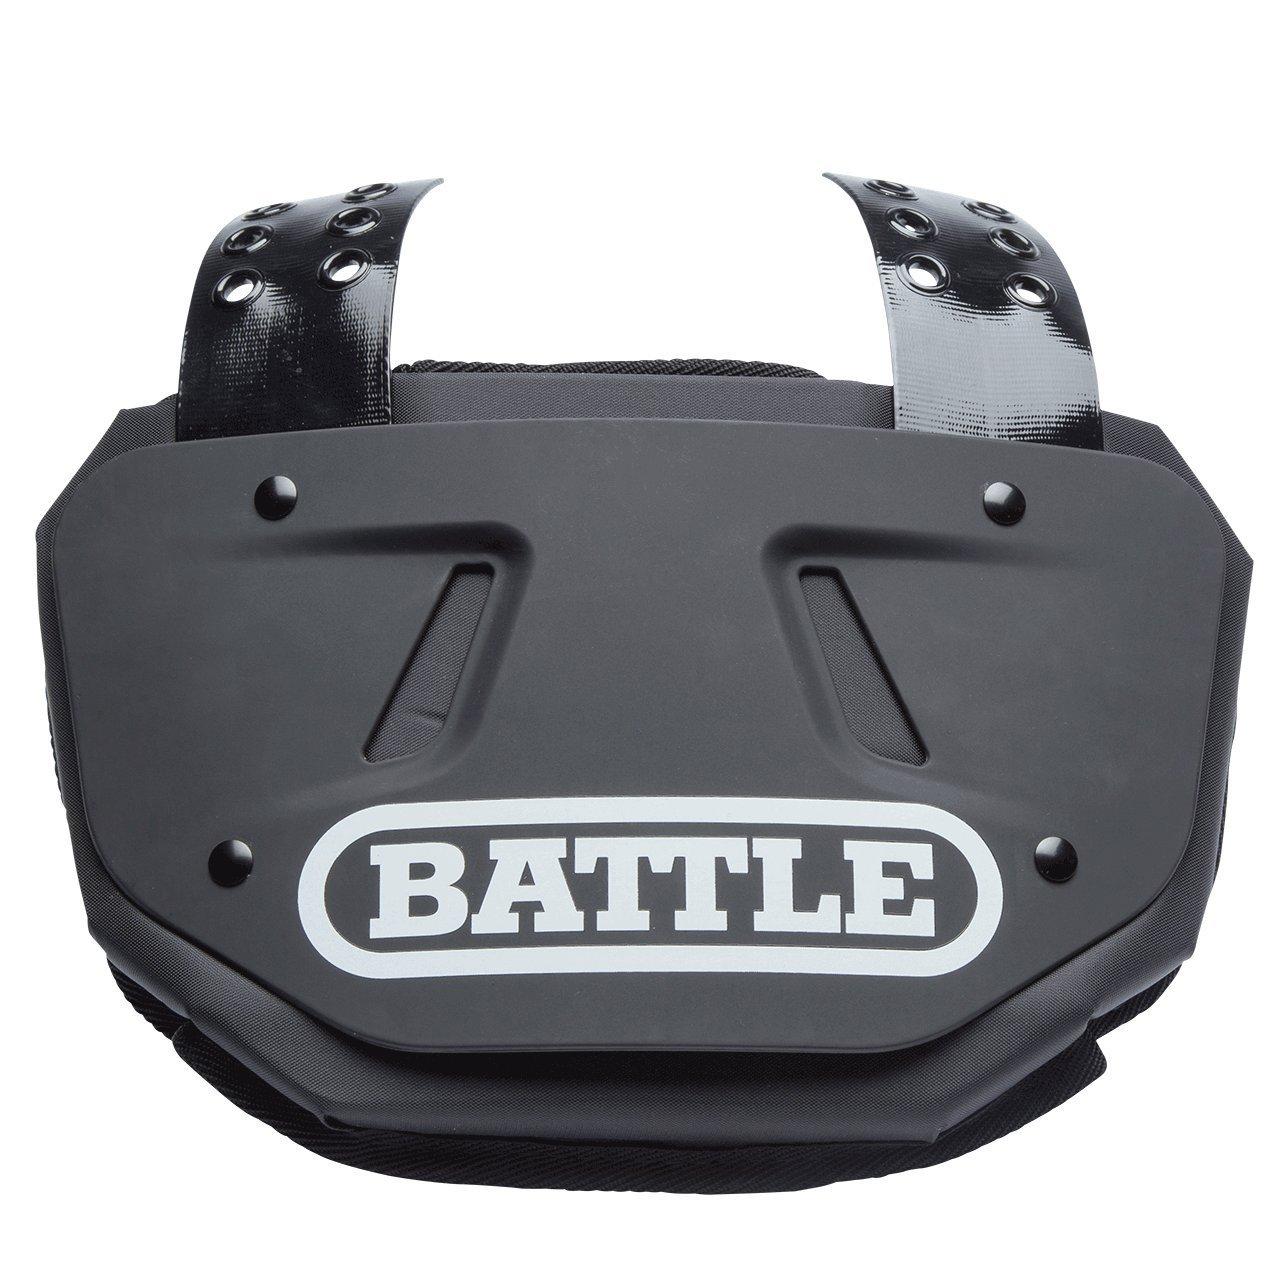 Battle back plate